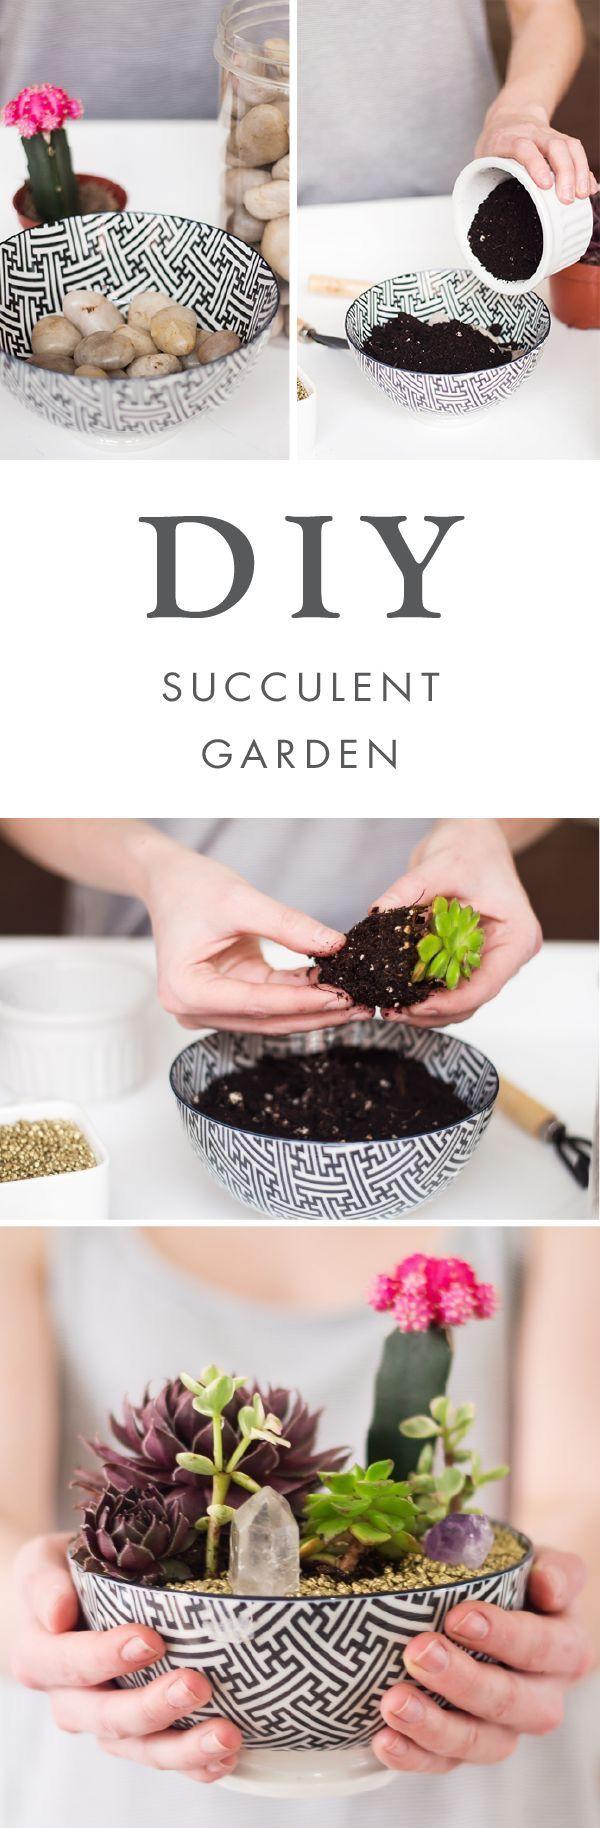 best diy images on pinterest bricolage craft and gardening